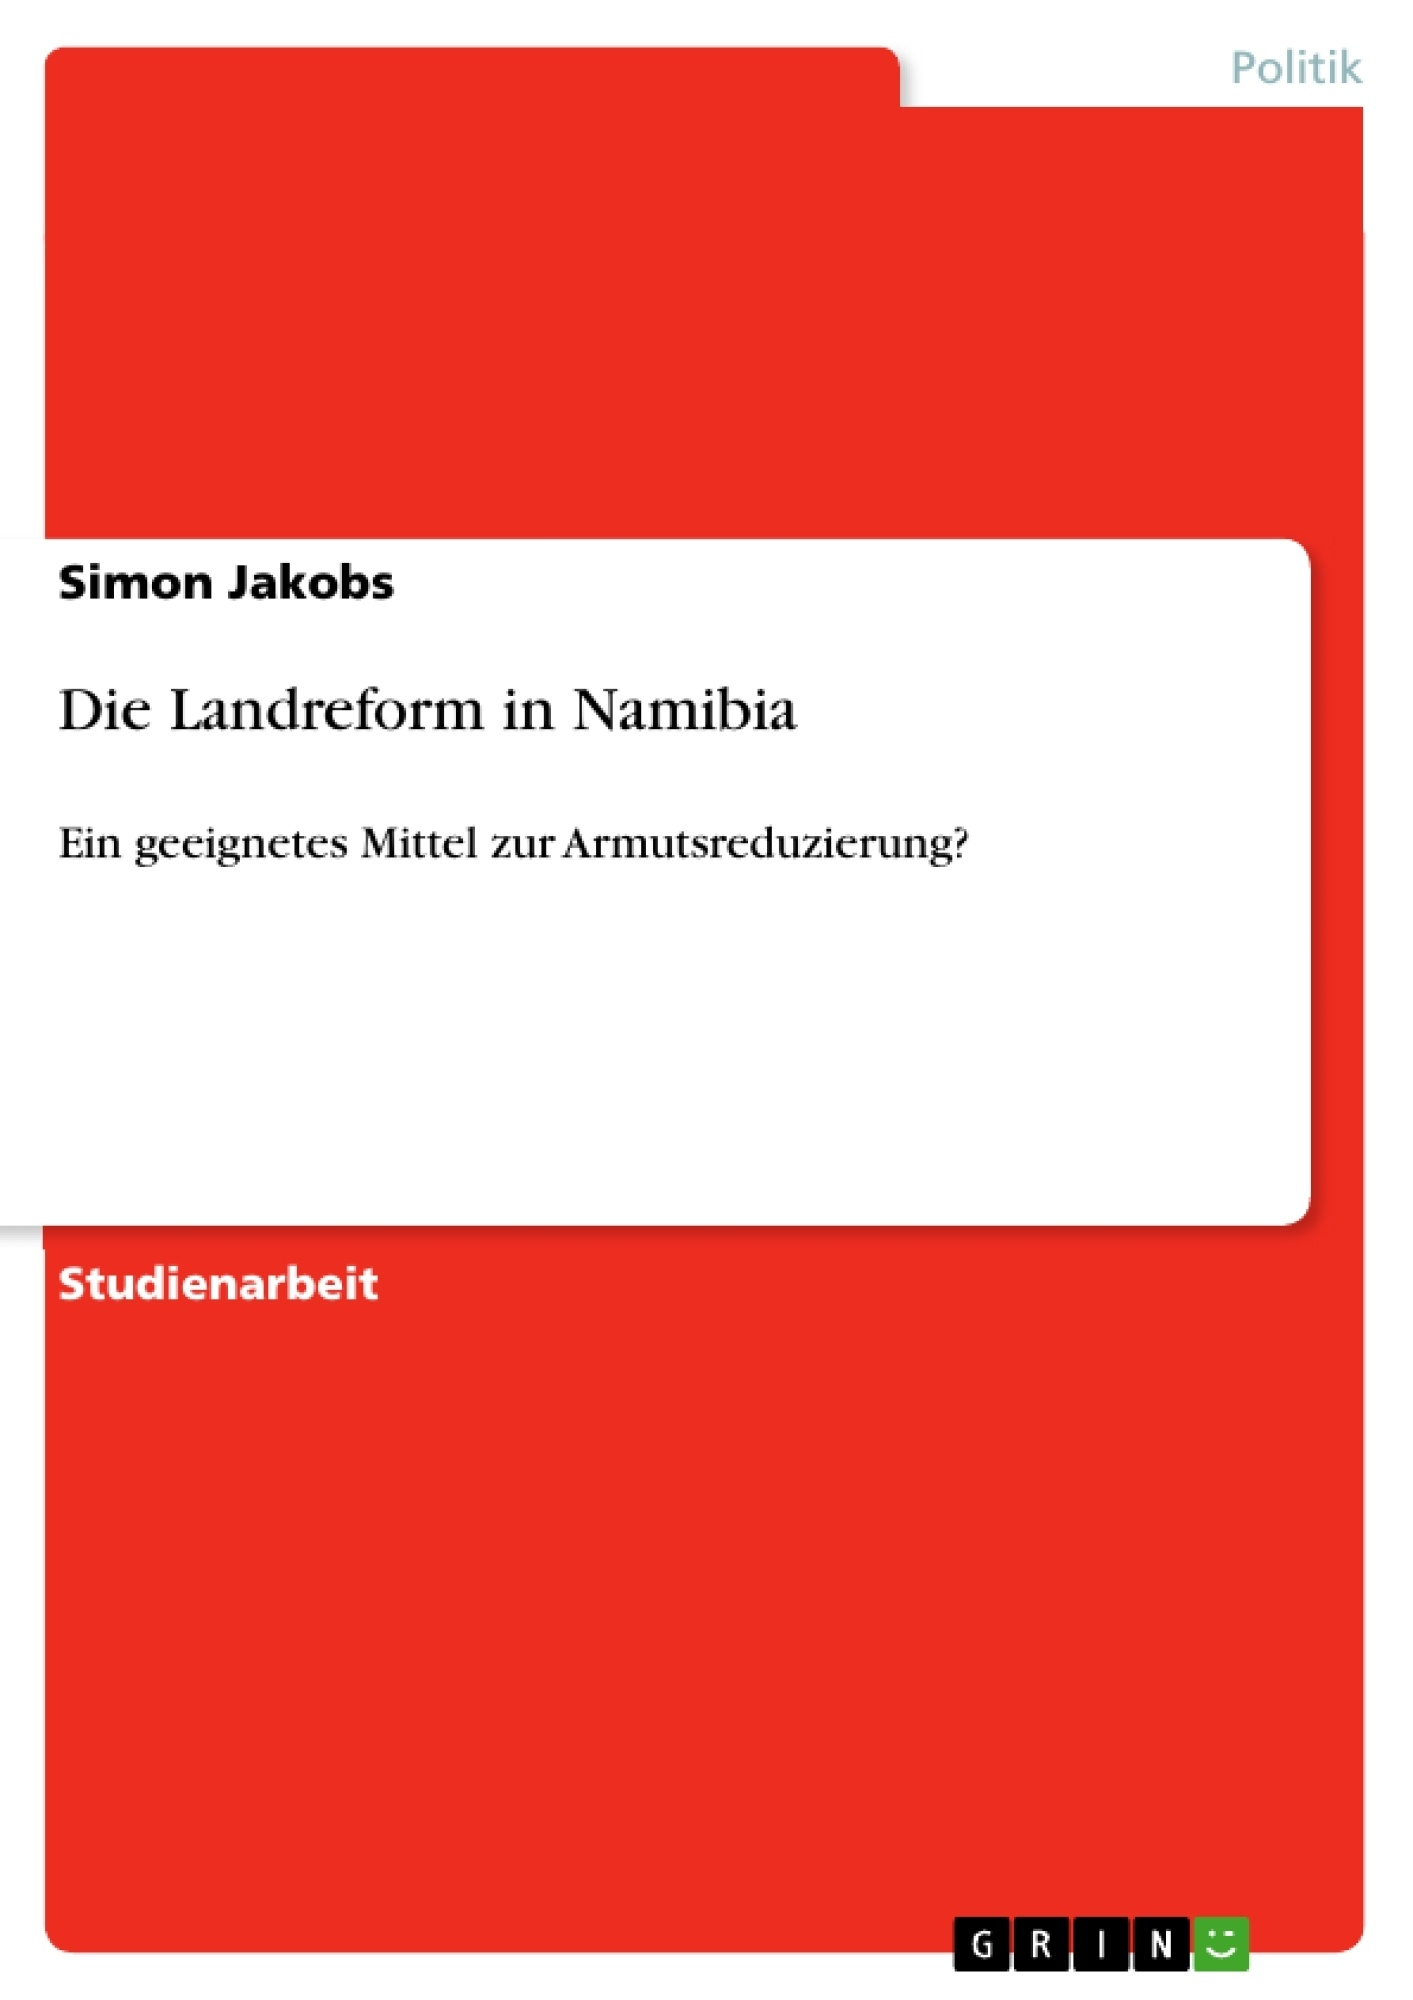 Titel: Die Landreform in Namibia